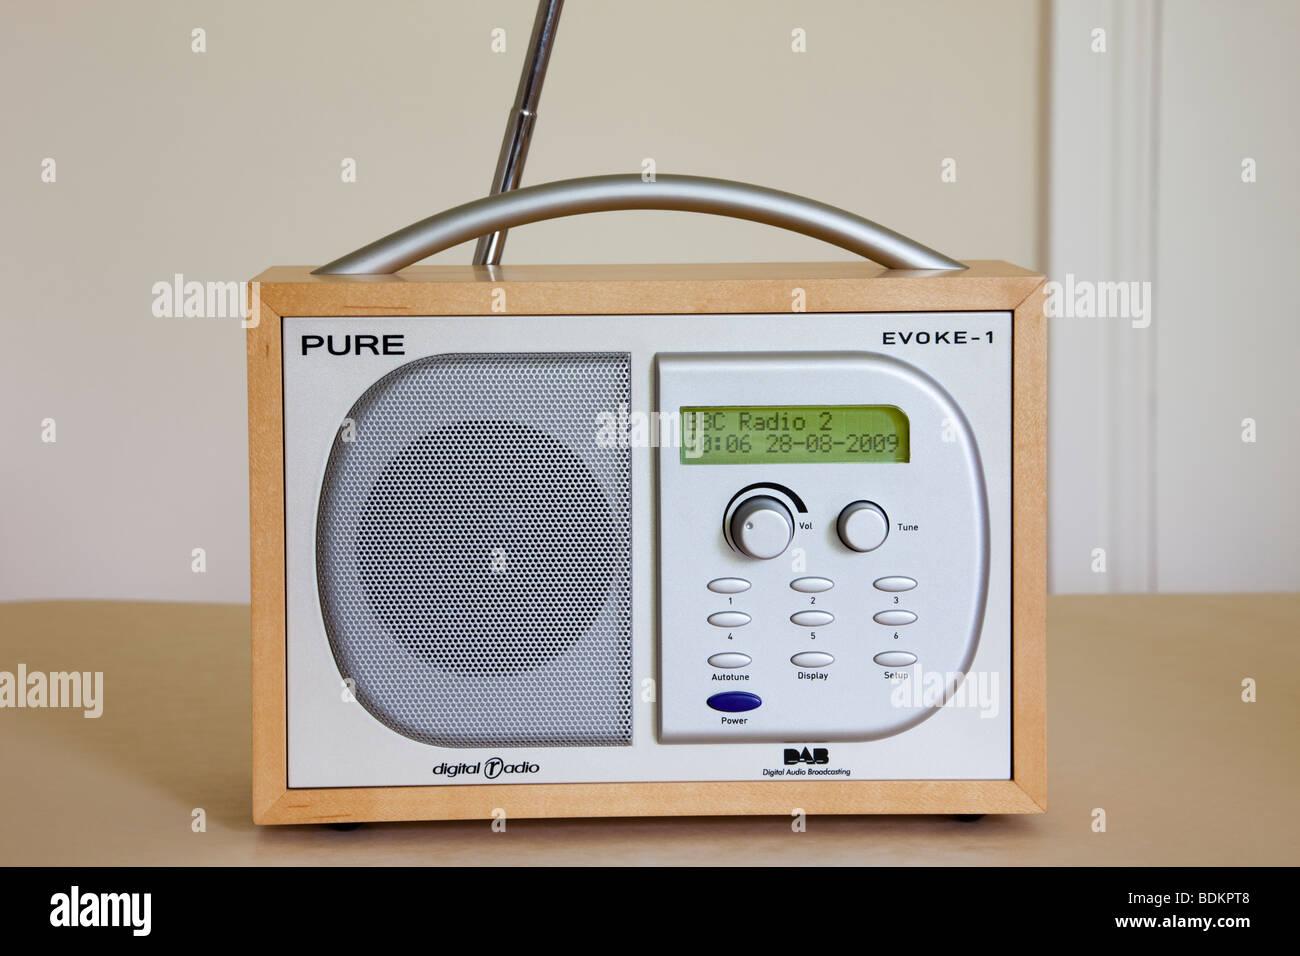 Pure Evoke-1 Retro style DAB digital radio tuned in to BBC radio 2 - Stock Image